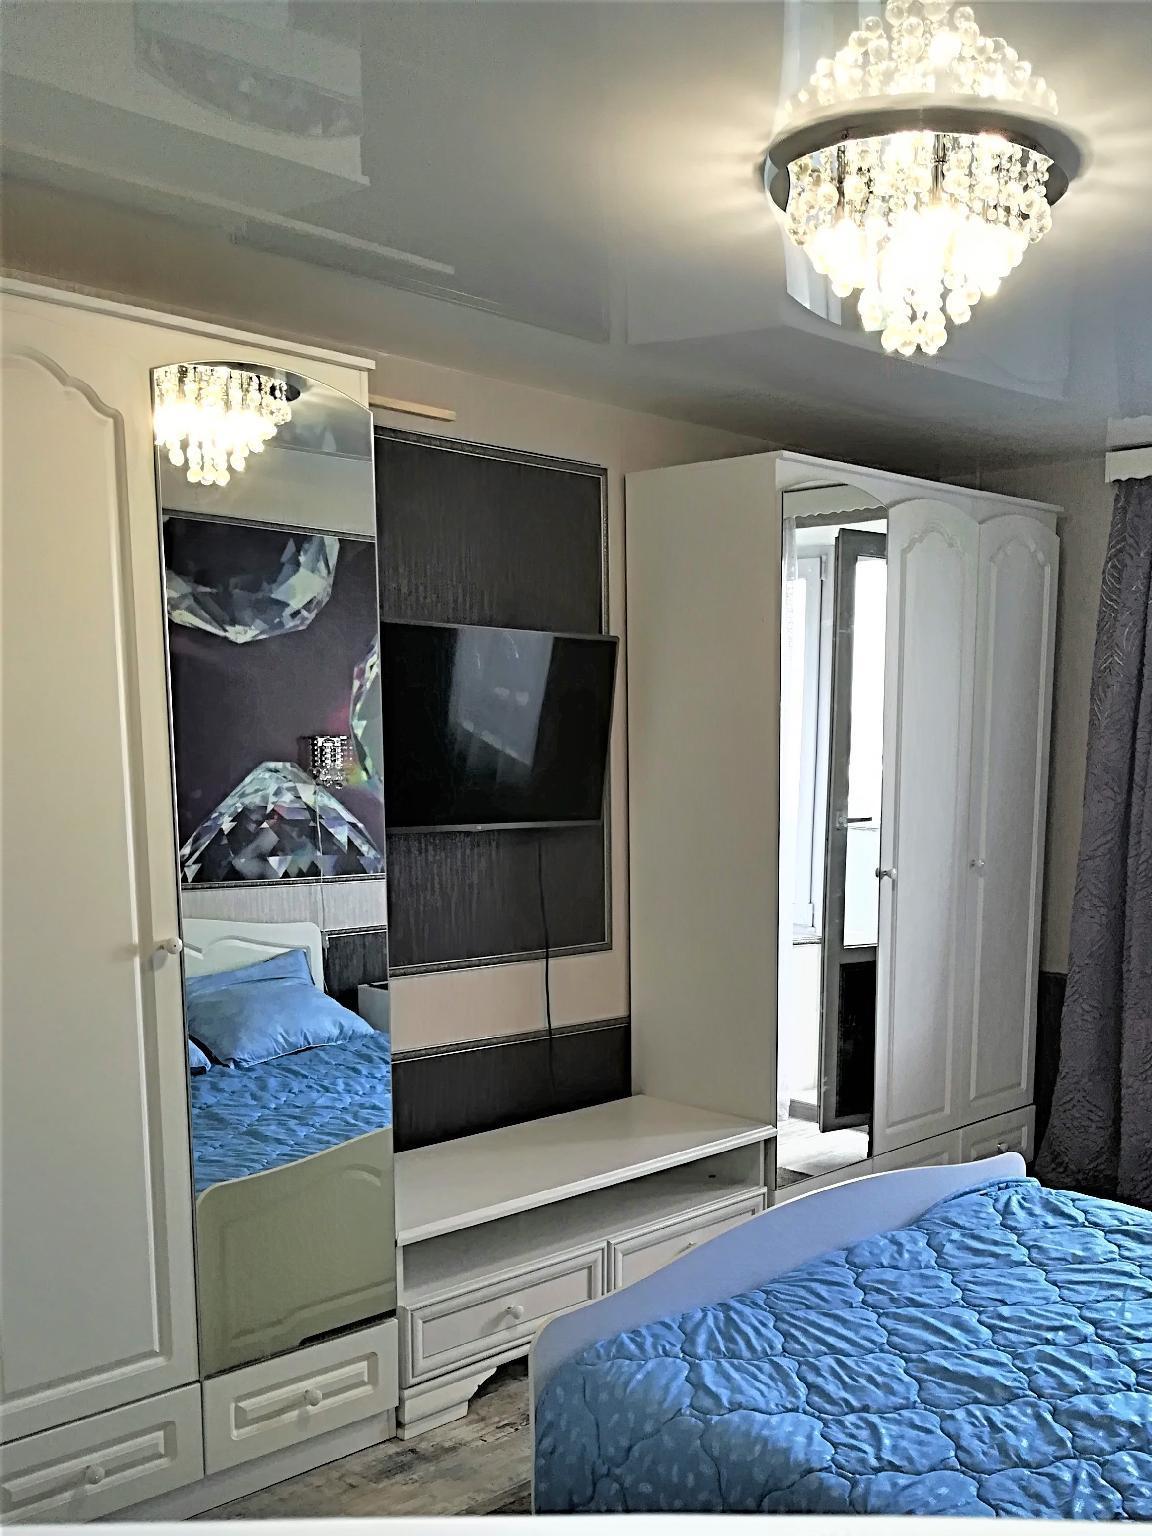 2 bedroom Apartment Near Metro Elektrozavodskaya